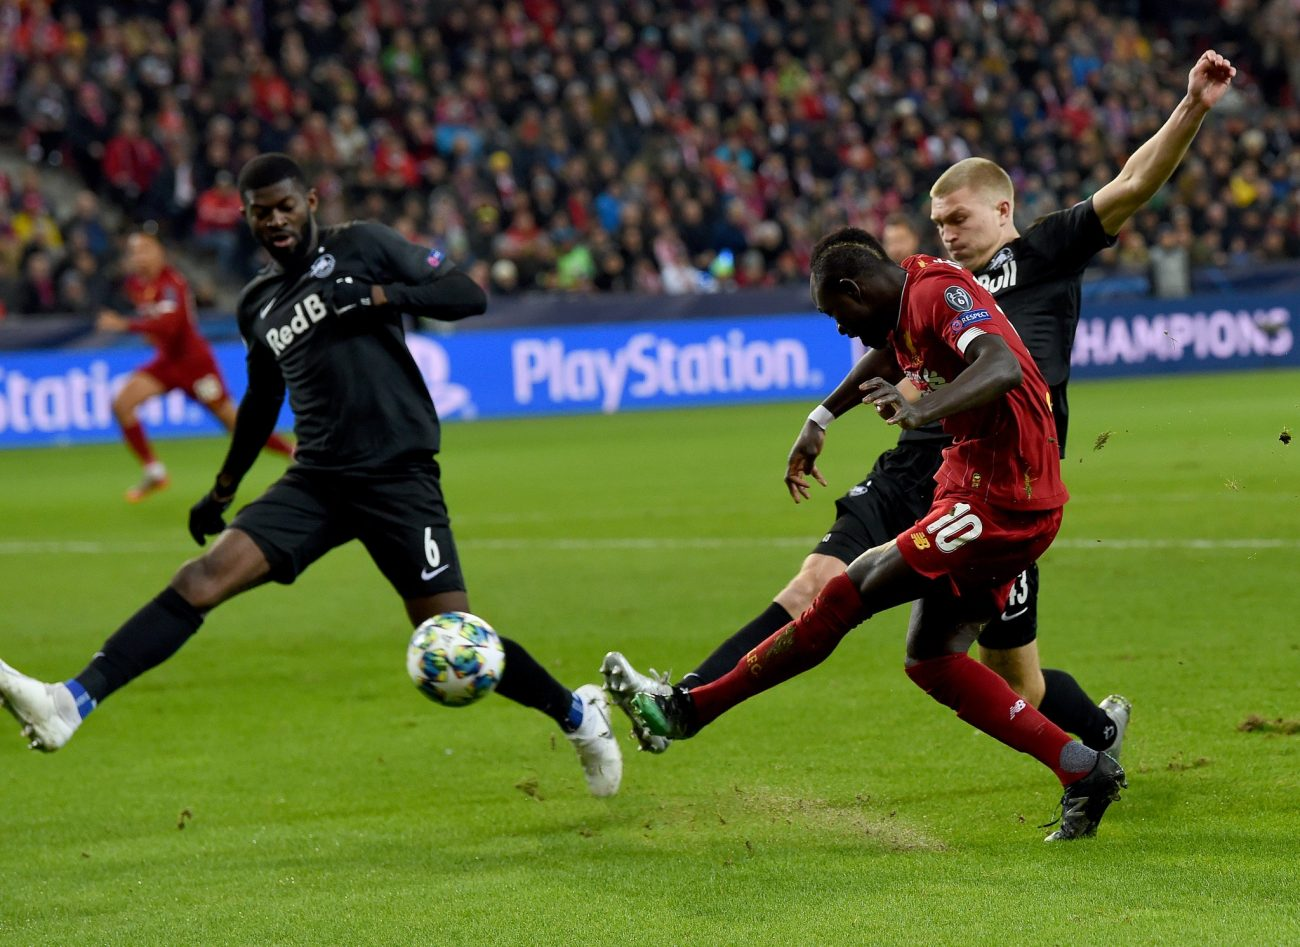 Salzburg 0-2 Liverpool – As it happened & reaction